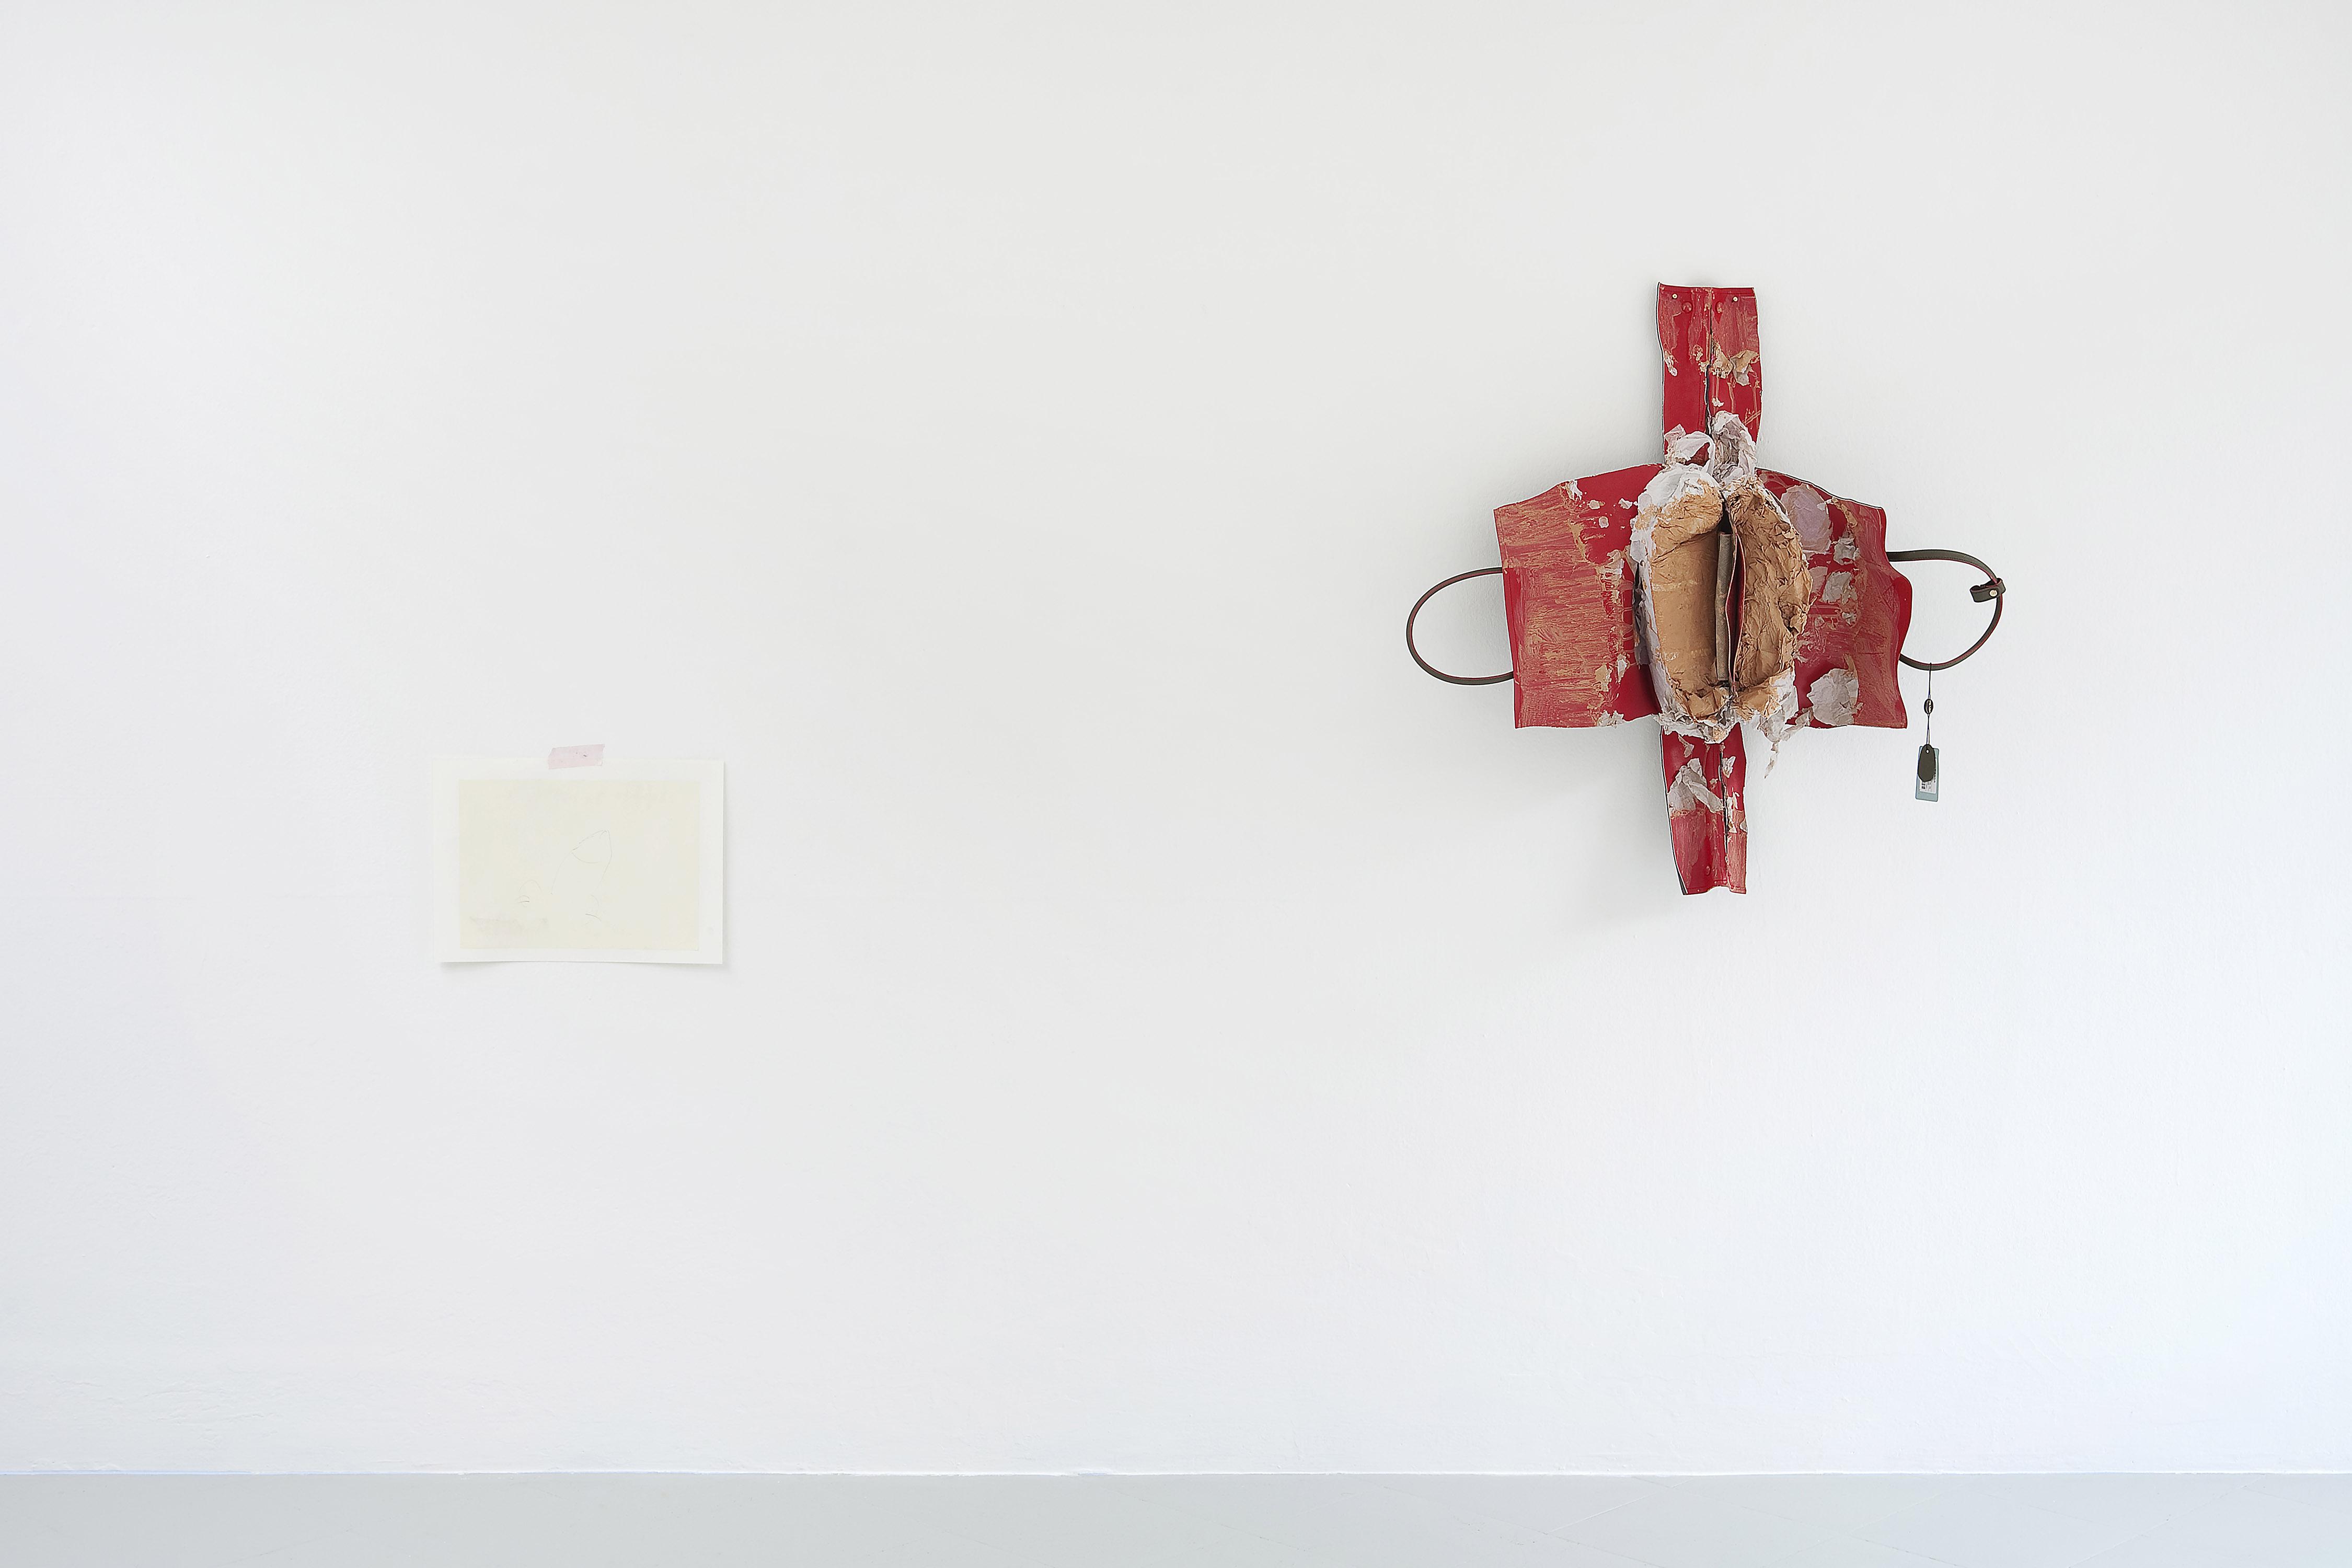 10 - Yves Scherer Installation view 2015 - Courtesy Studiolo Milan - Photo Filippo Armellin